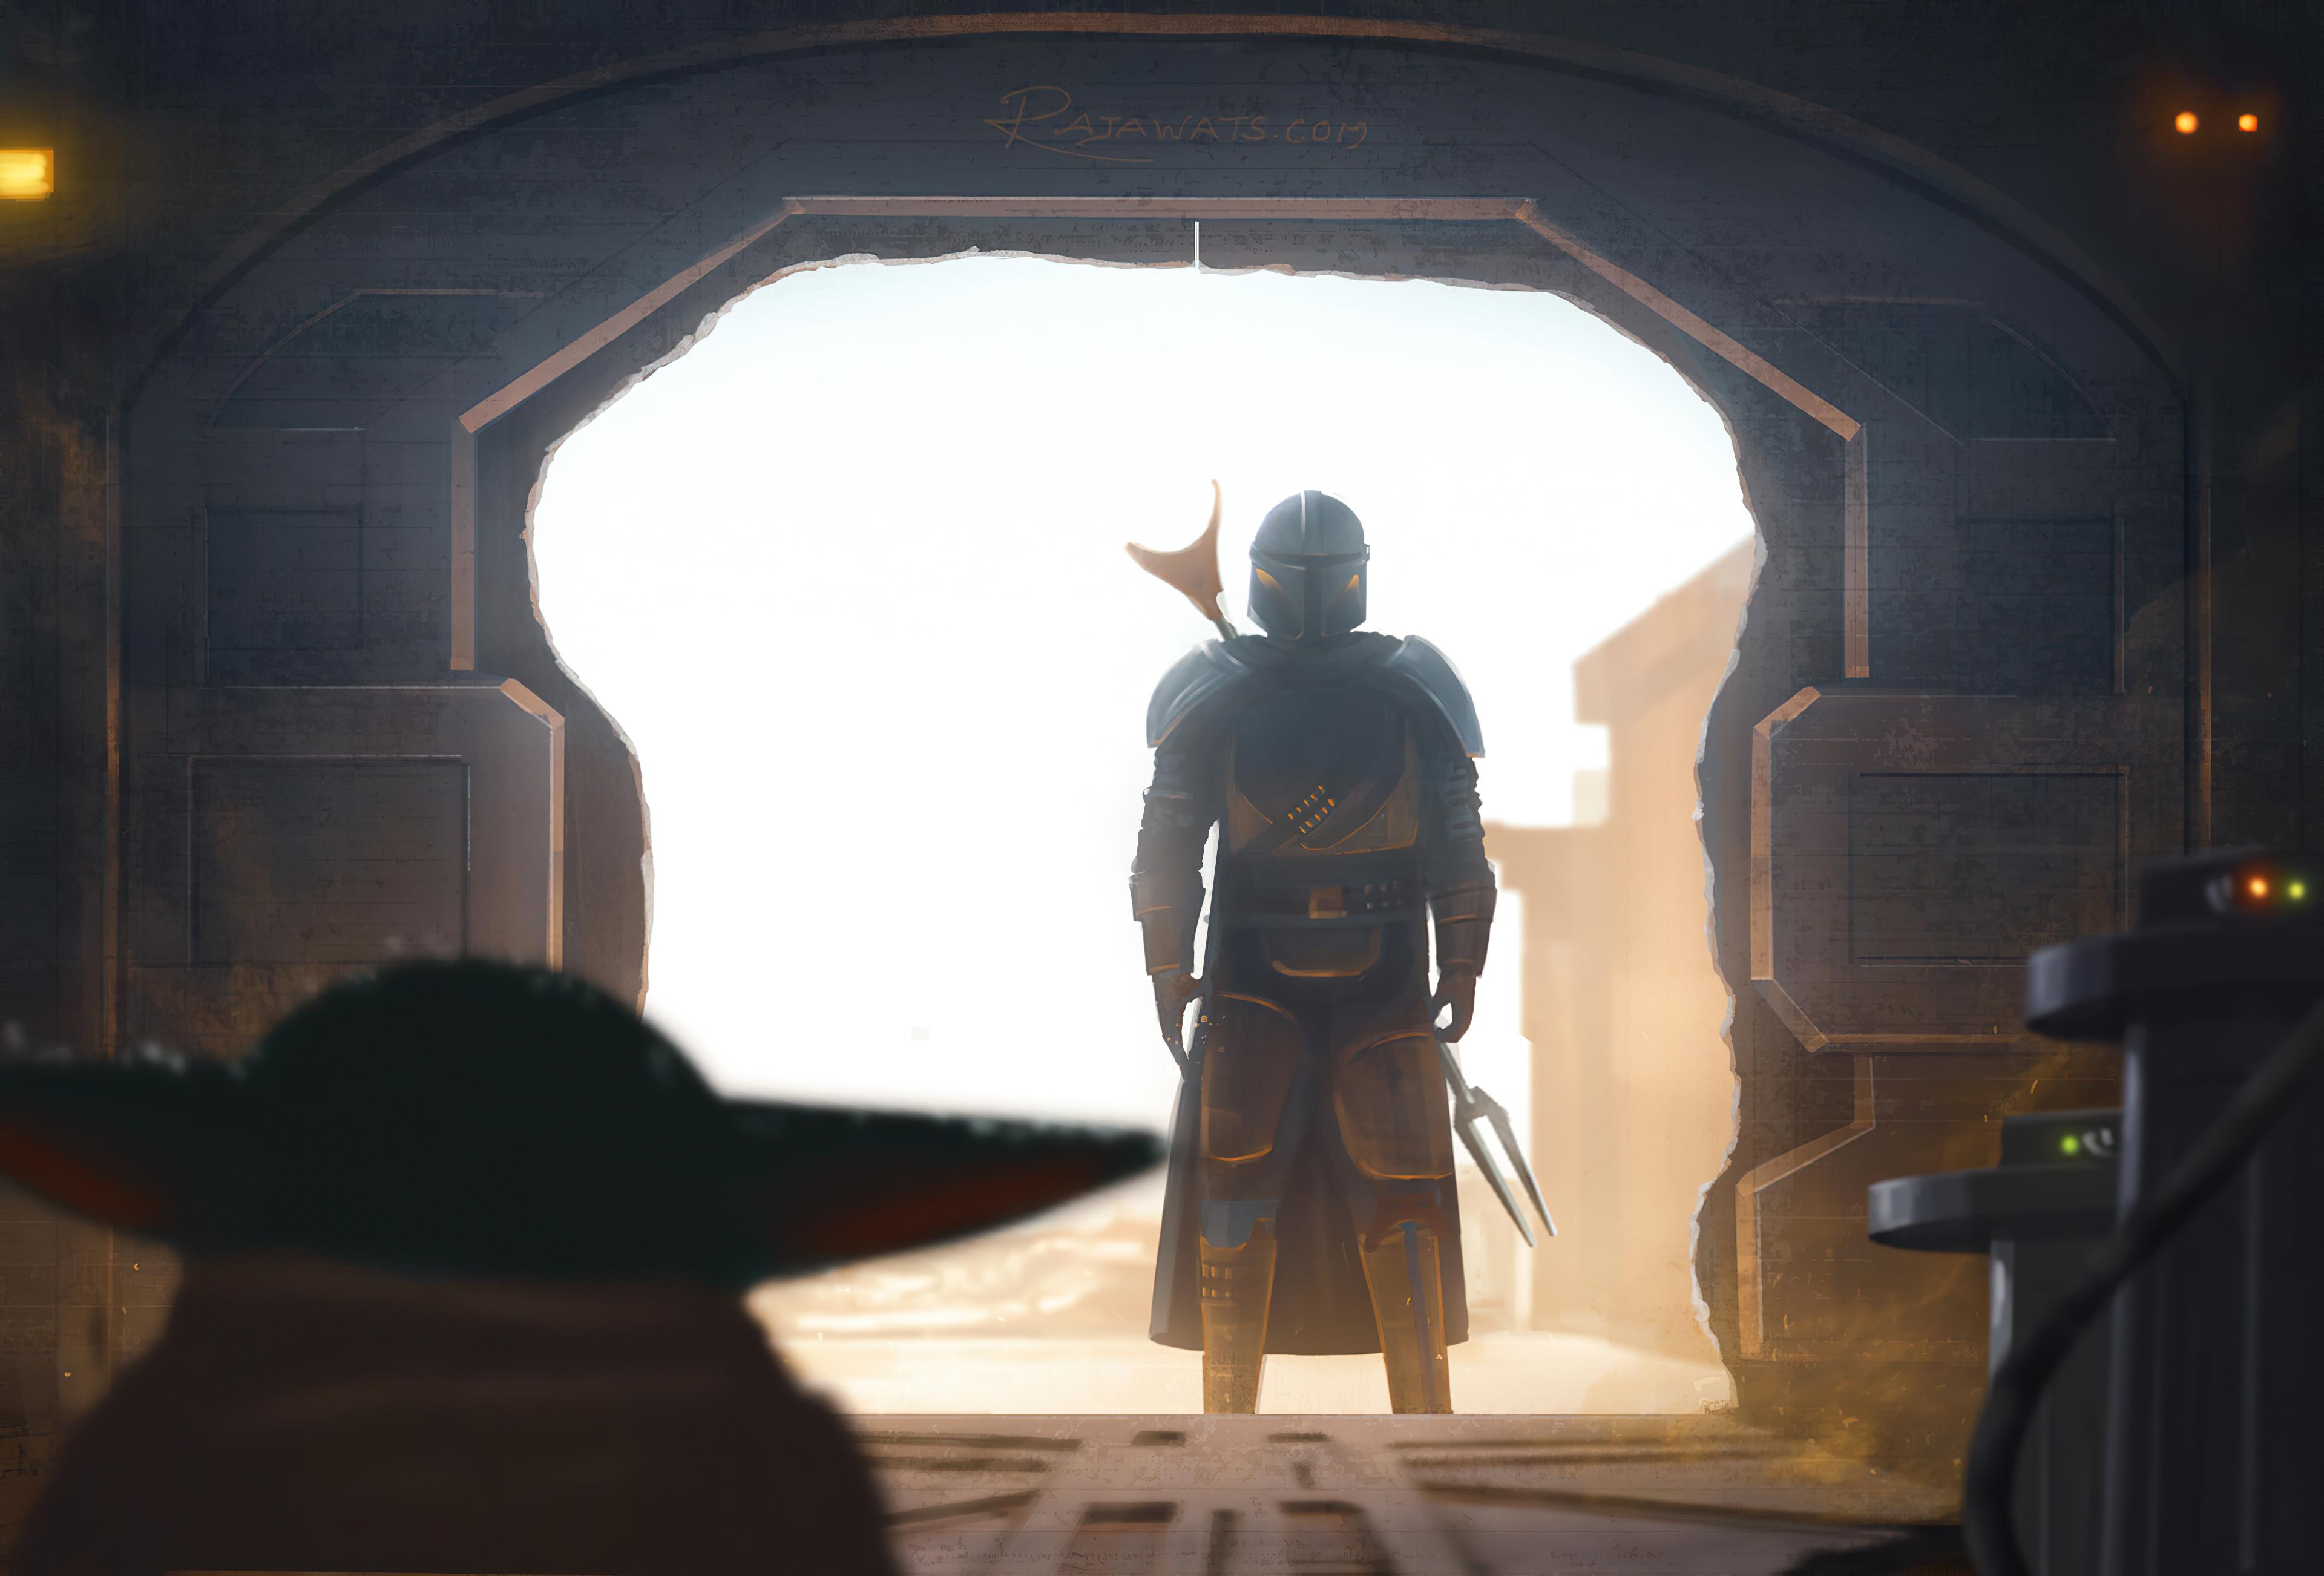 Baby Yoda Star Wars The Mandalorian Character 3840x2604